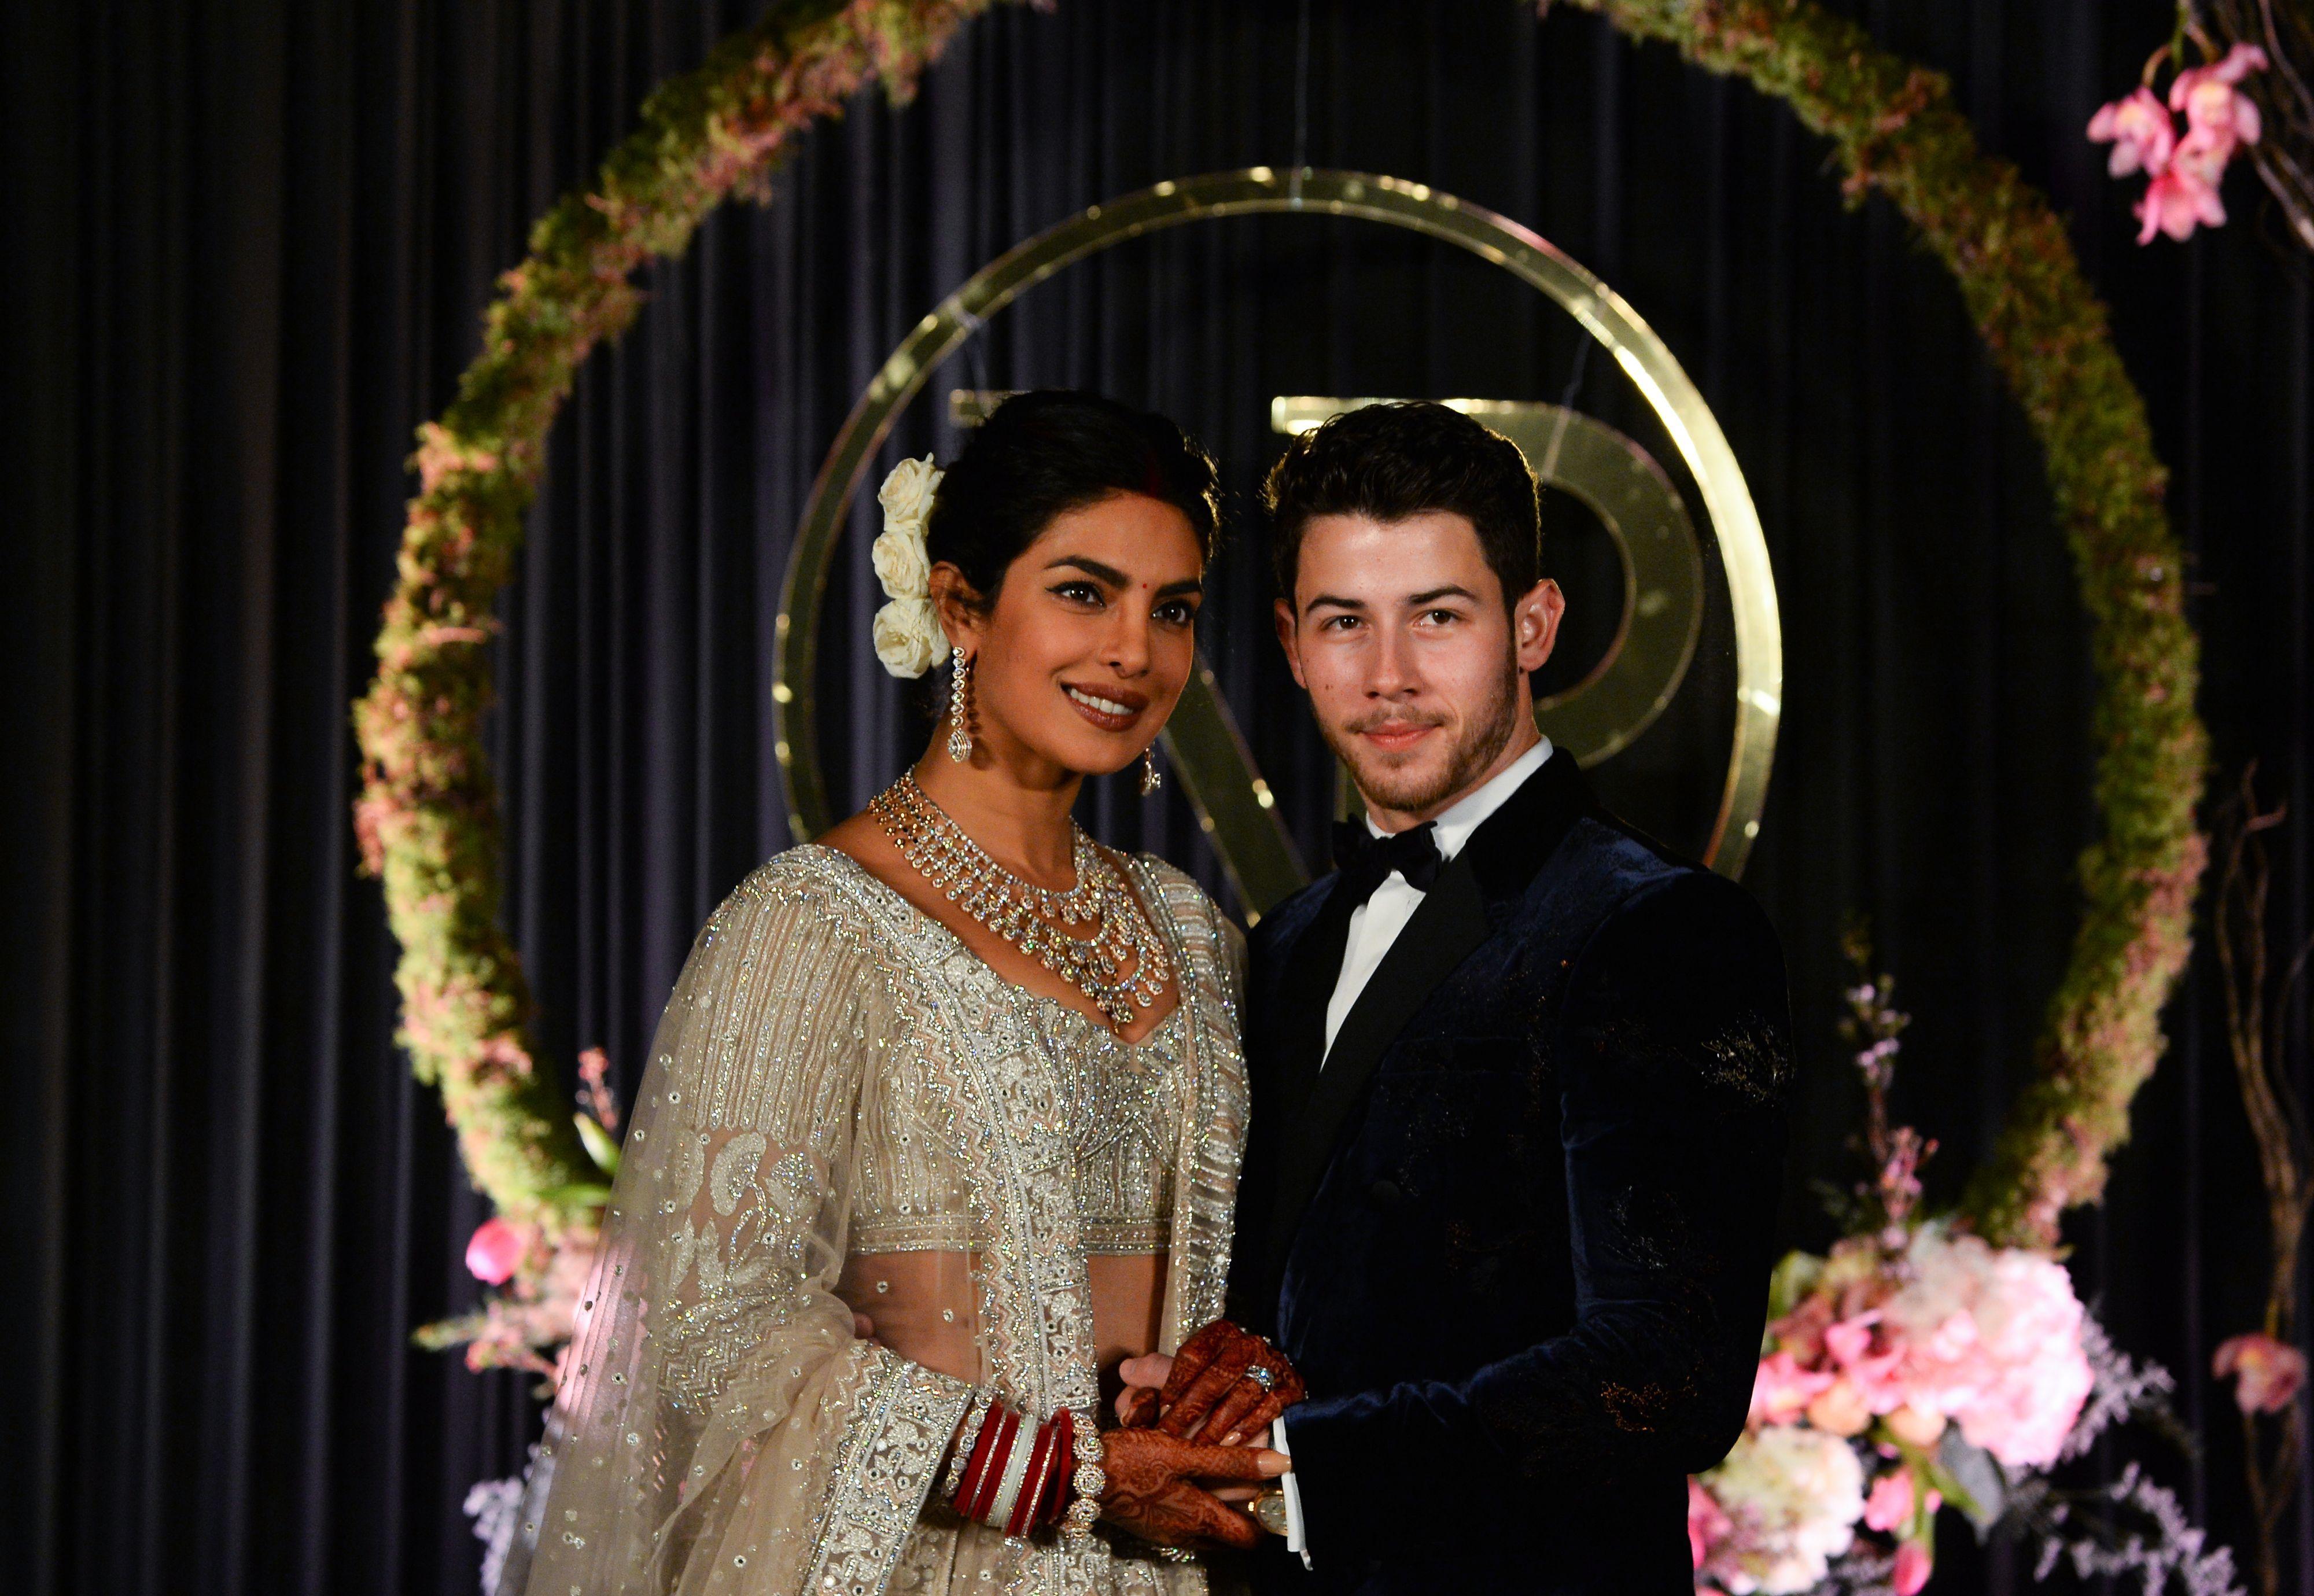 35b2225dc02 Priyanka Chopra Just Stepped Out in an Incredible Reception Dress